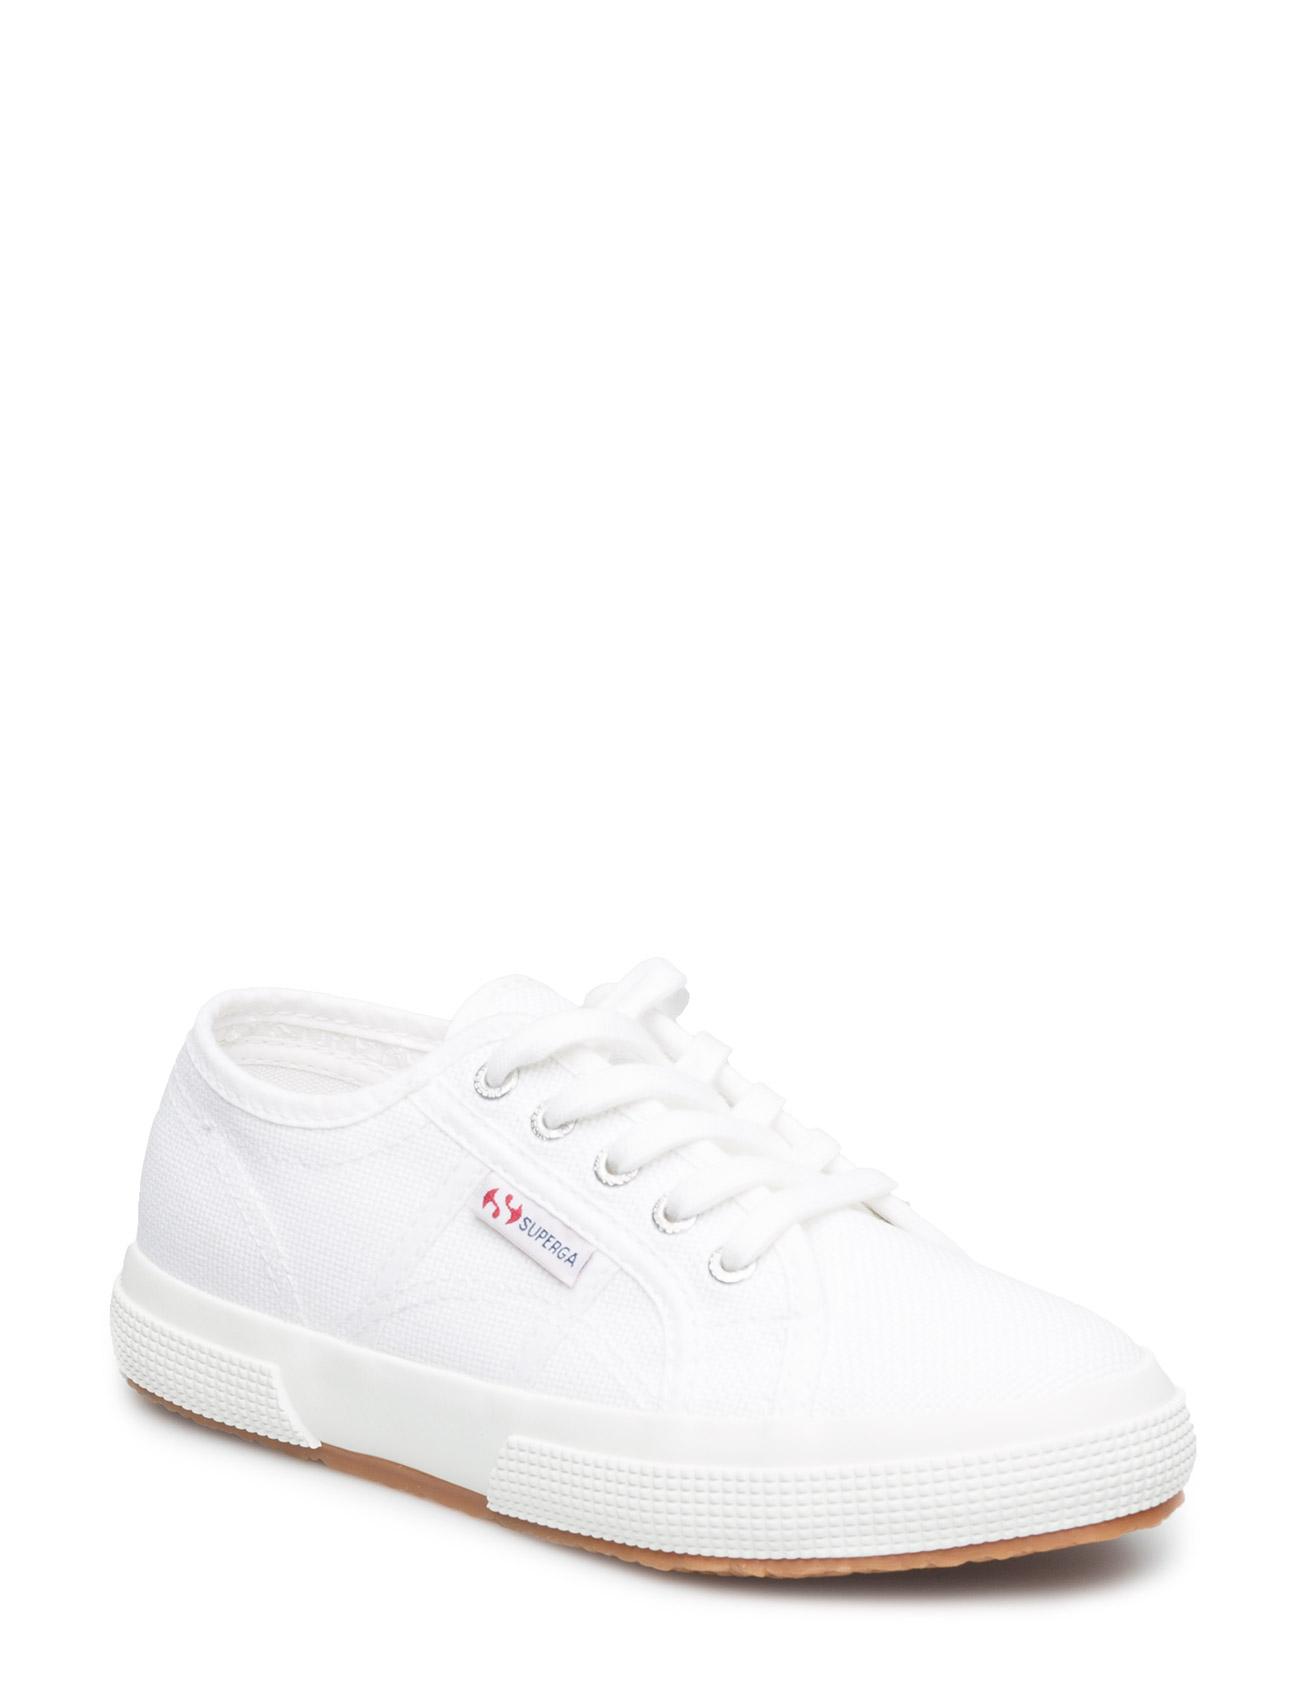 Superga 2750-Jcot Classic Superga Sko & Sneakers til Børn i hvid